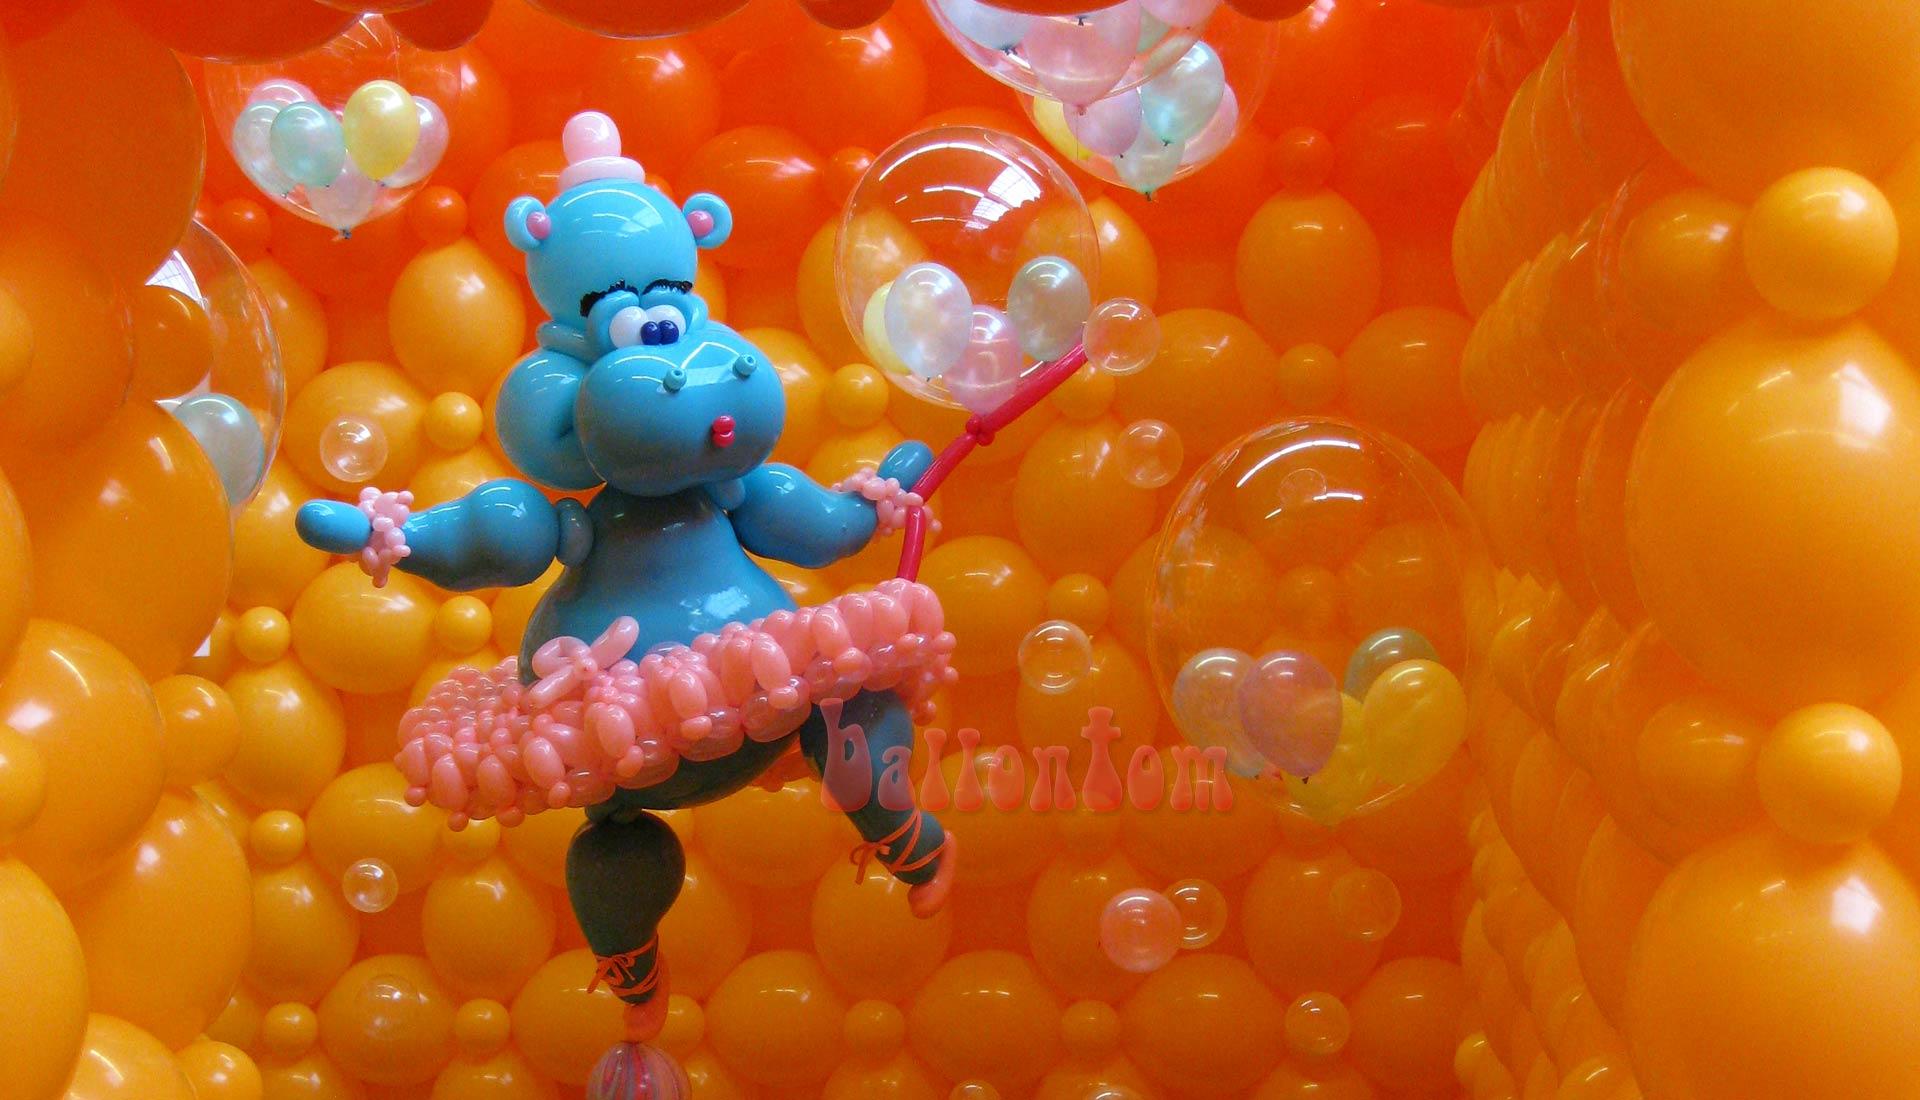 Weltrekord! Größtes Ballonlabyrinth mit über 100.000 Ballons mit ballontom - Nilpferd